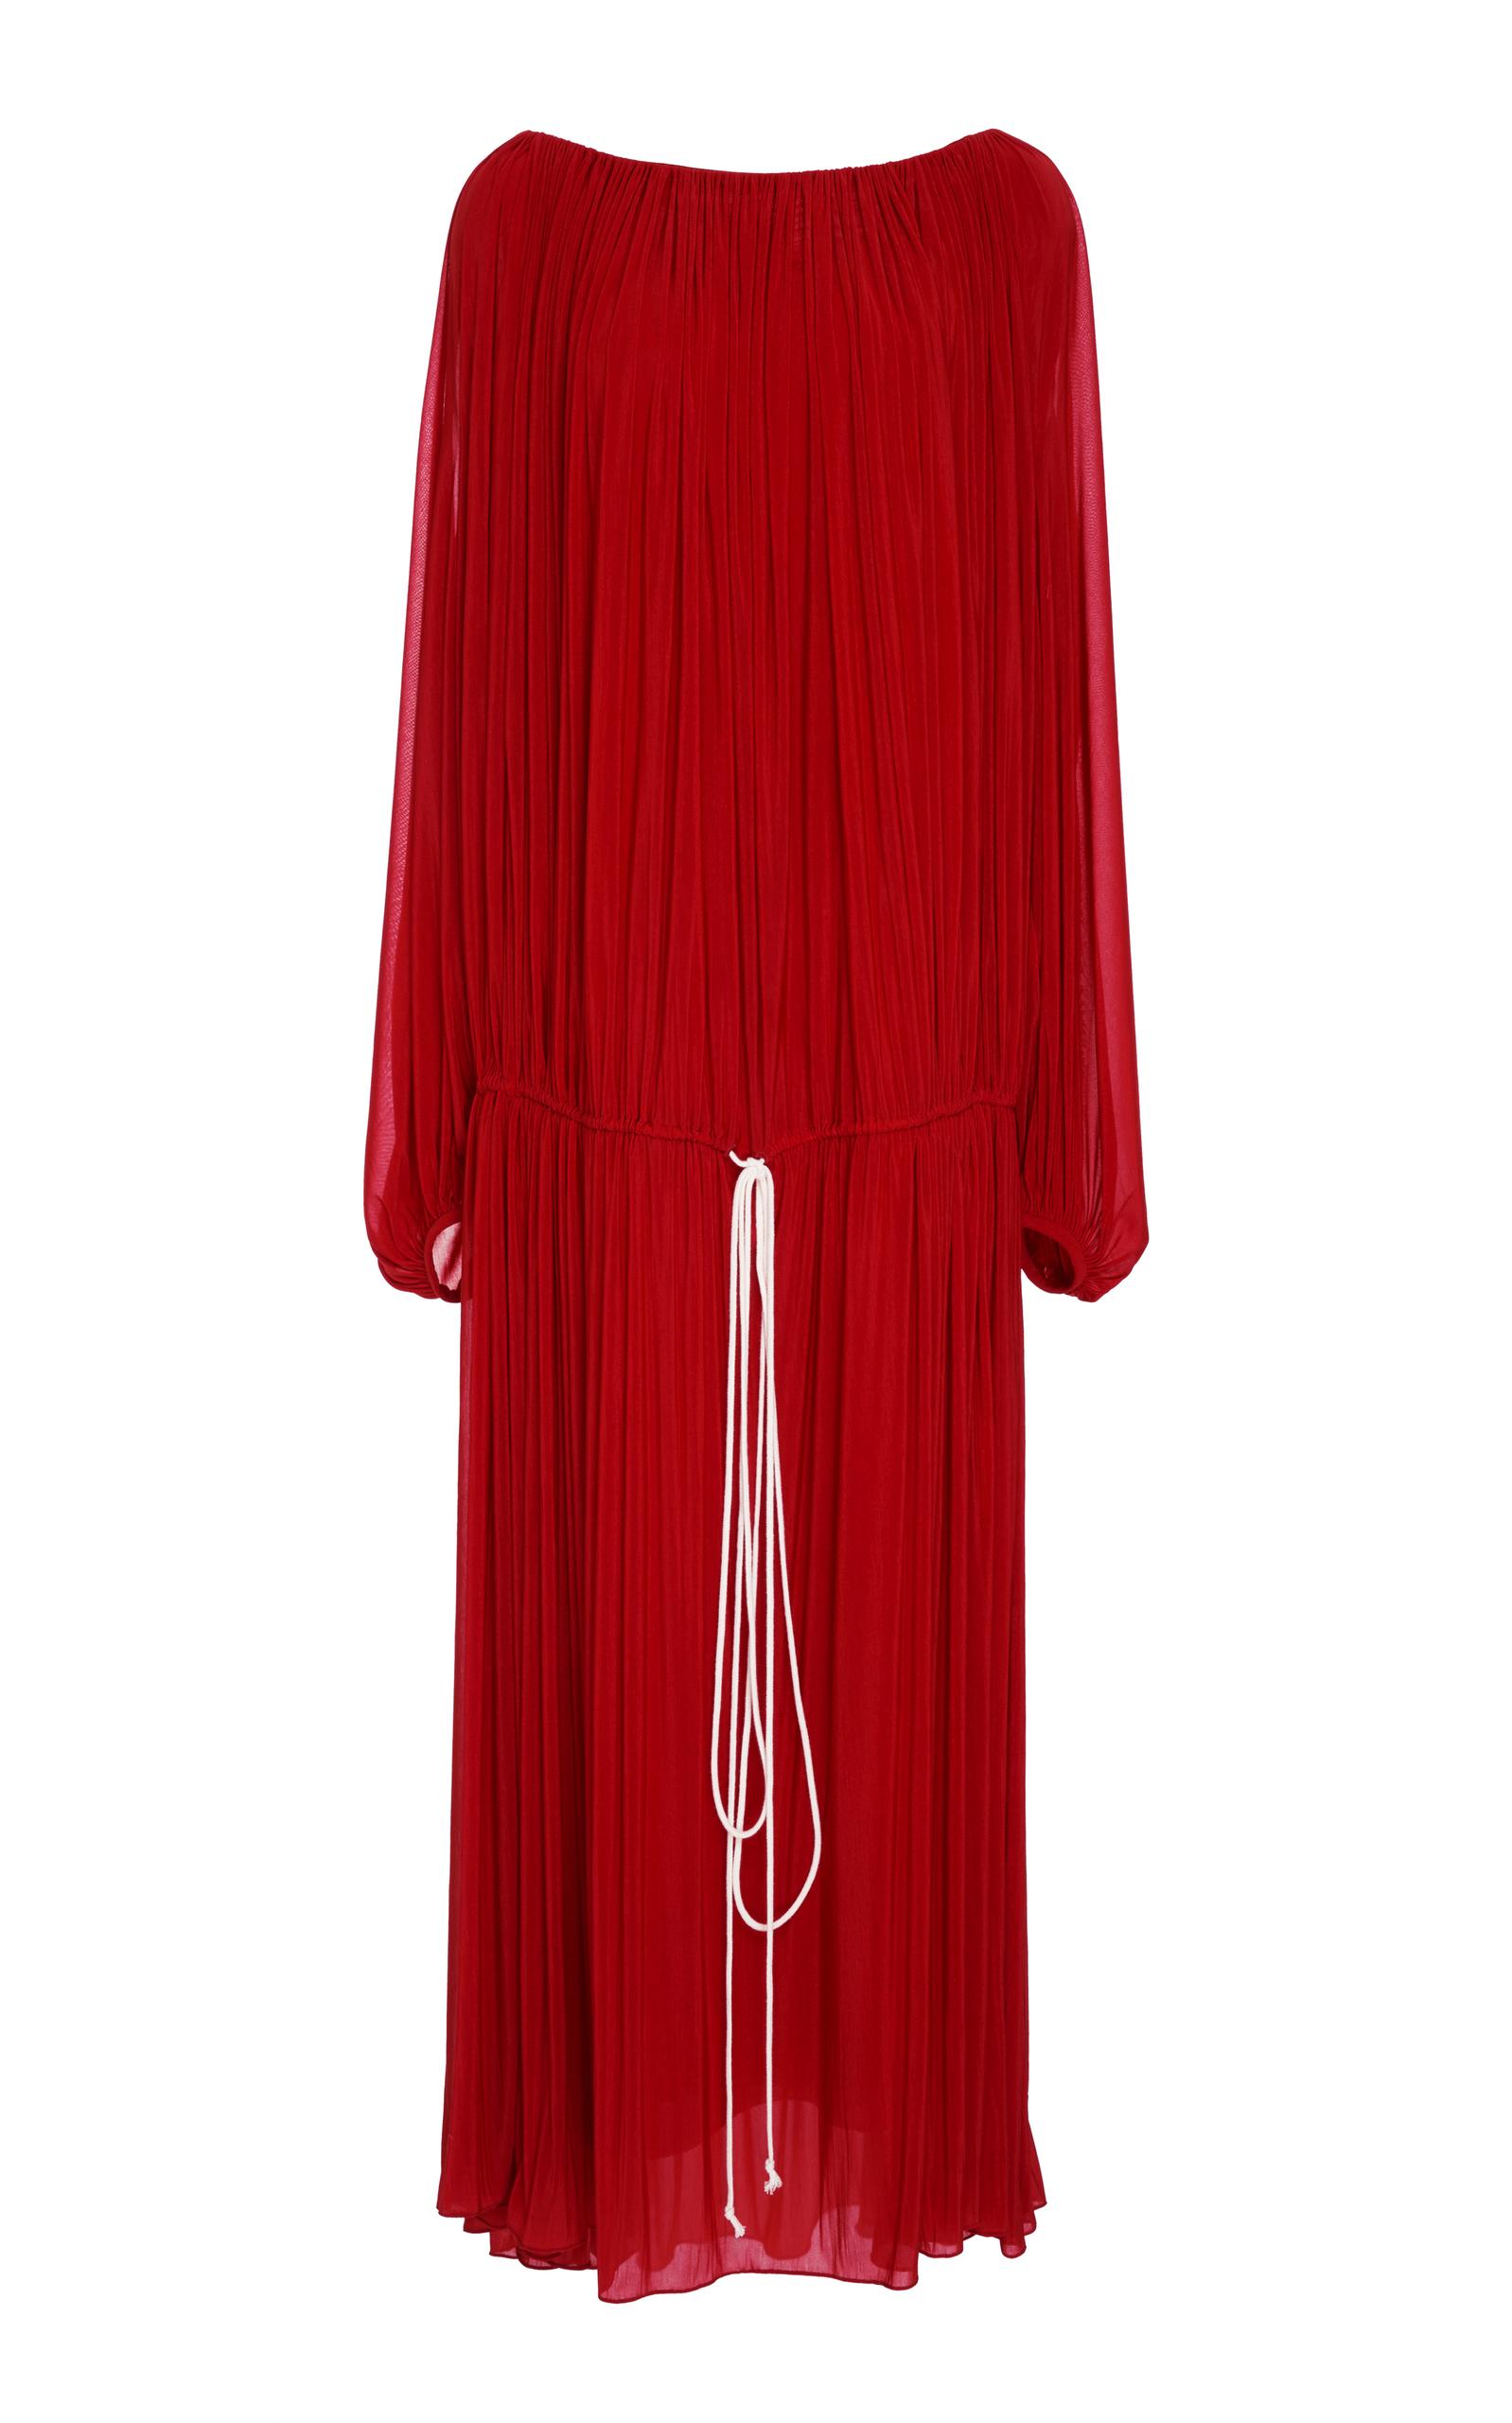 DRESSES - Short dresses BY. Bonnie Young ushLT4cy